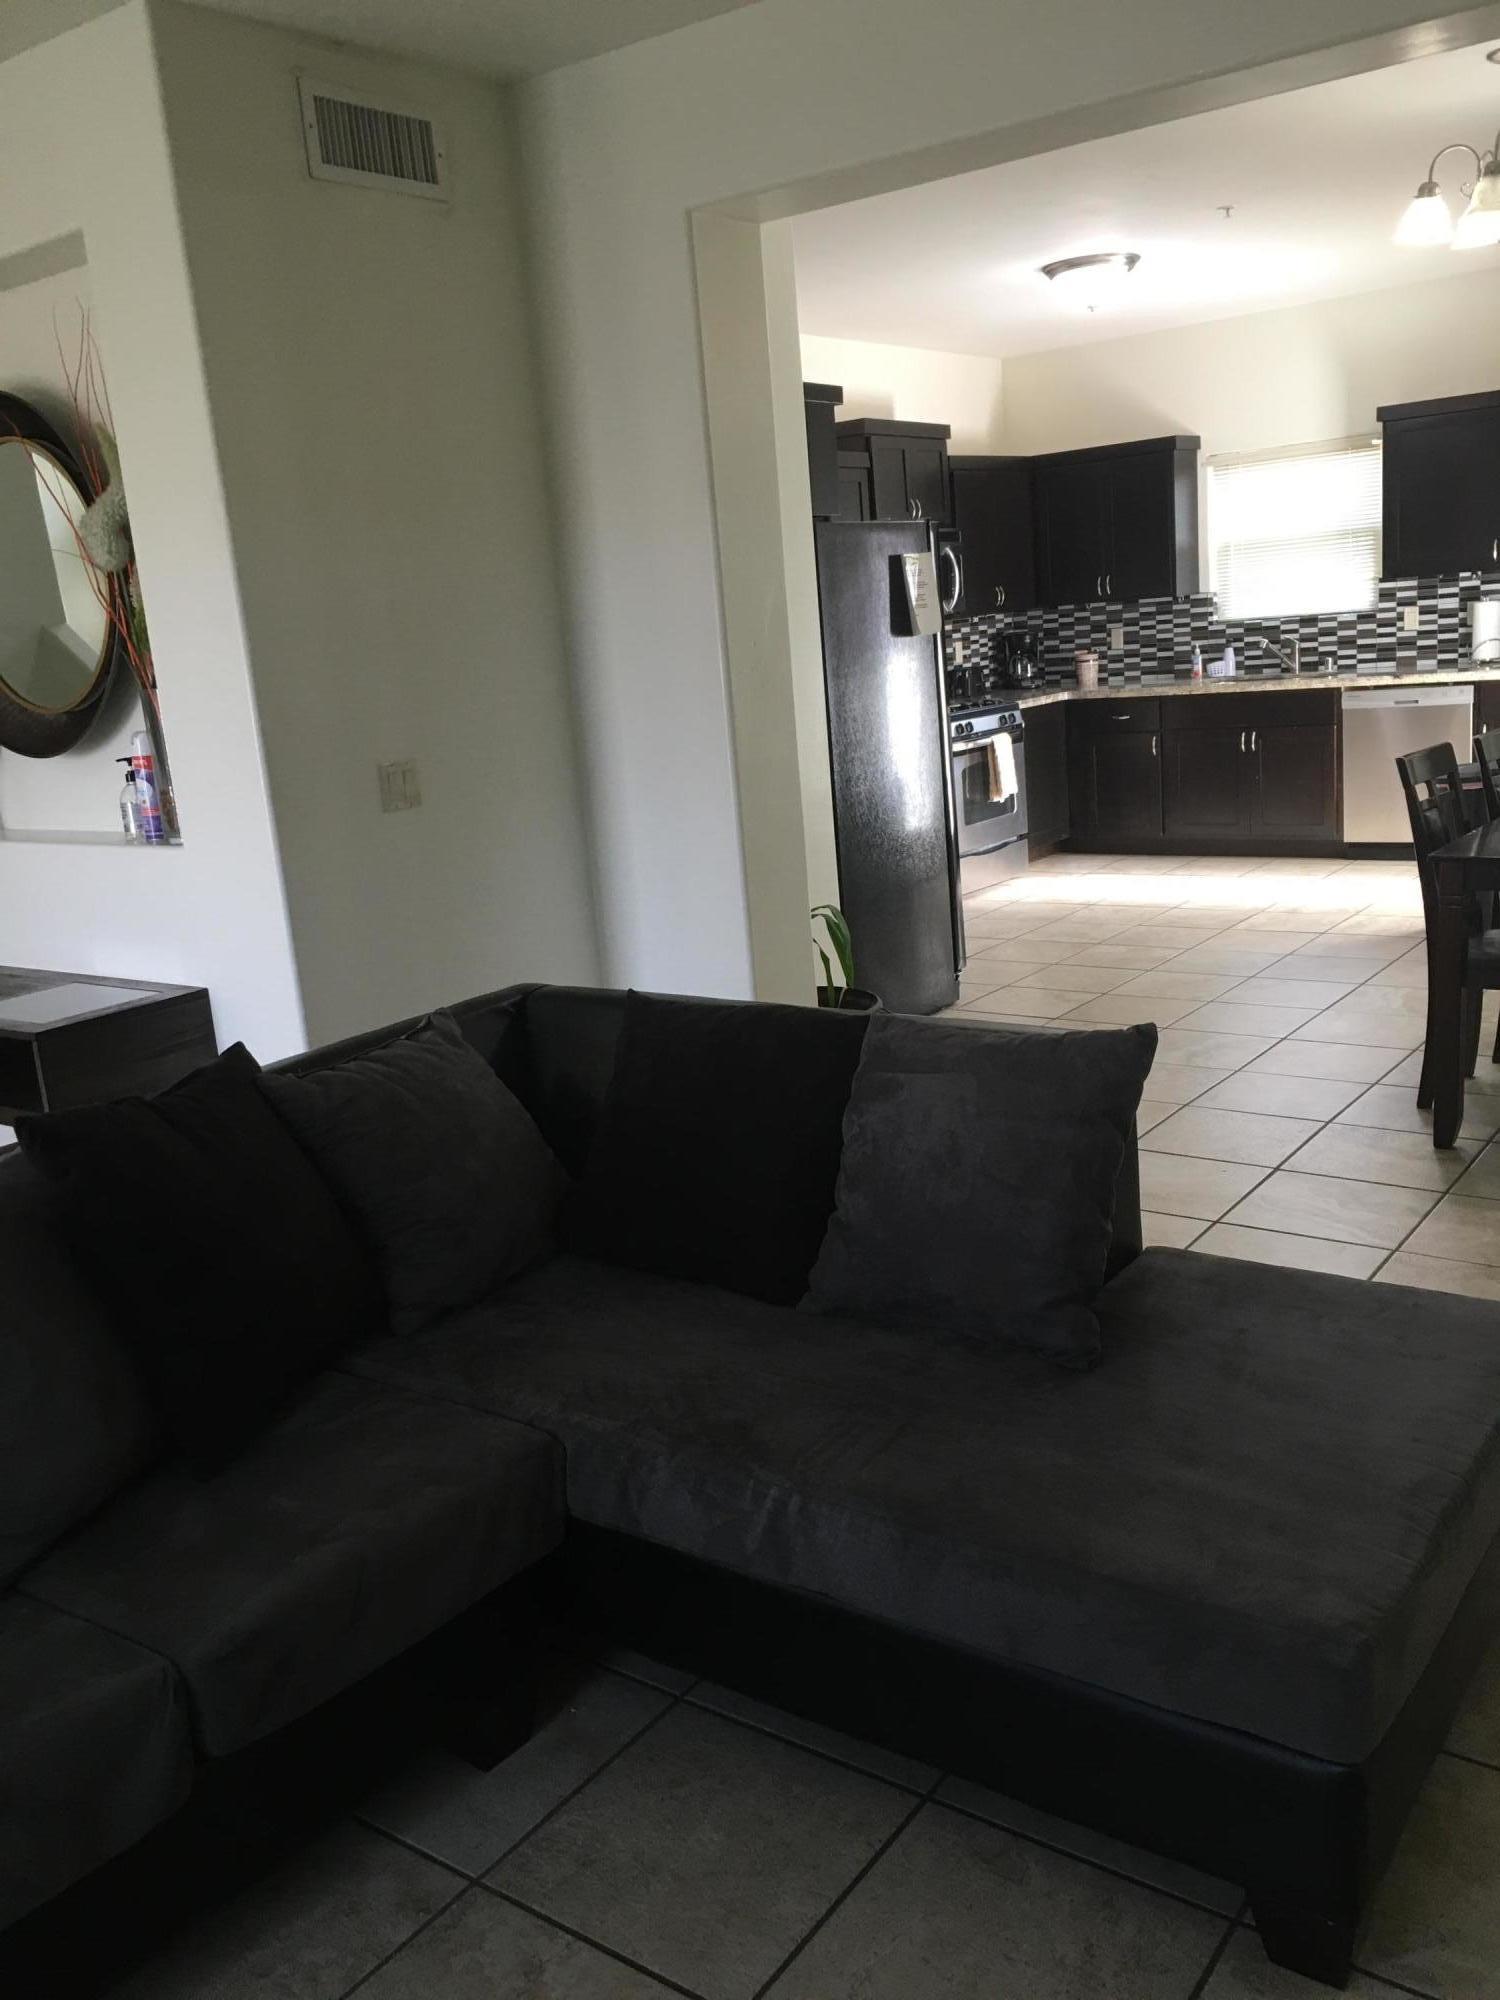 4686 Pistolero Lane, El Paso, Texas 79912, 3 Bedrooms Bedrooms, ,3 BathroomsBathrooms,Residential Rental,For Rent,Pistolero,837268